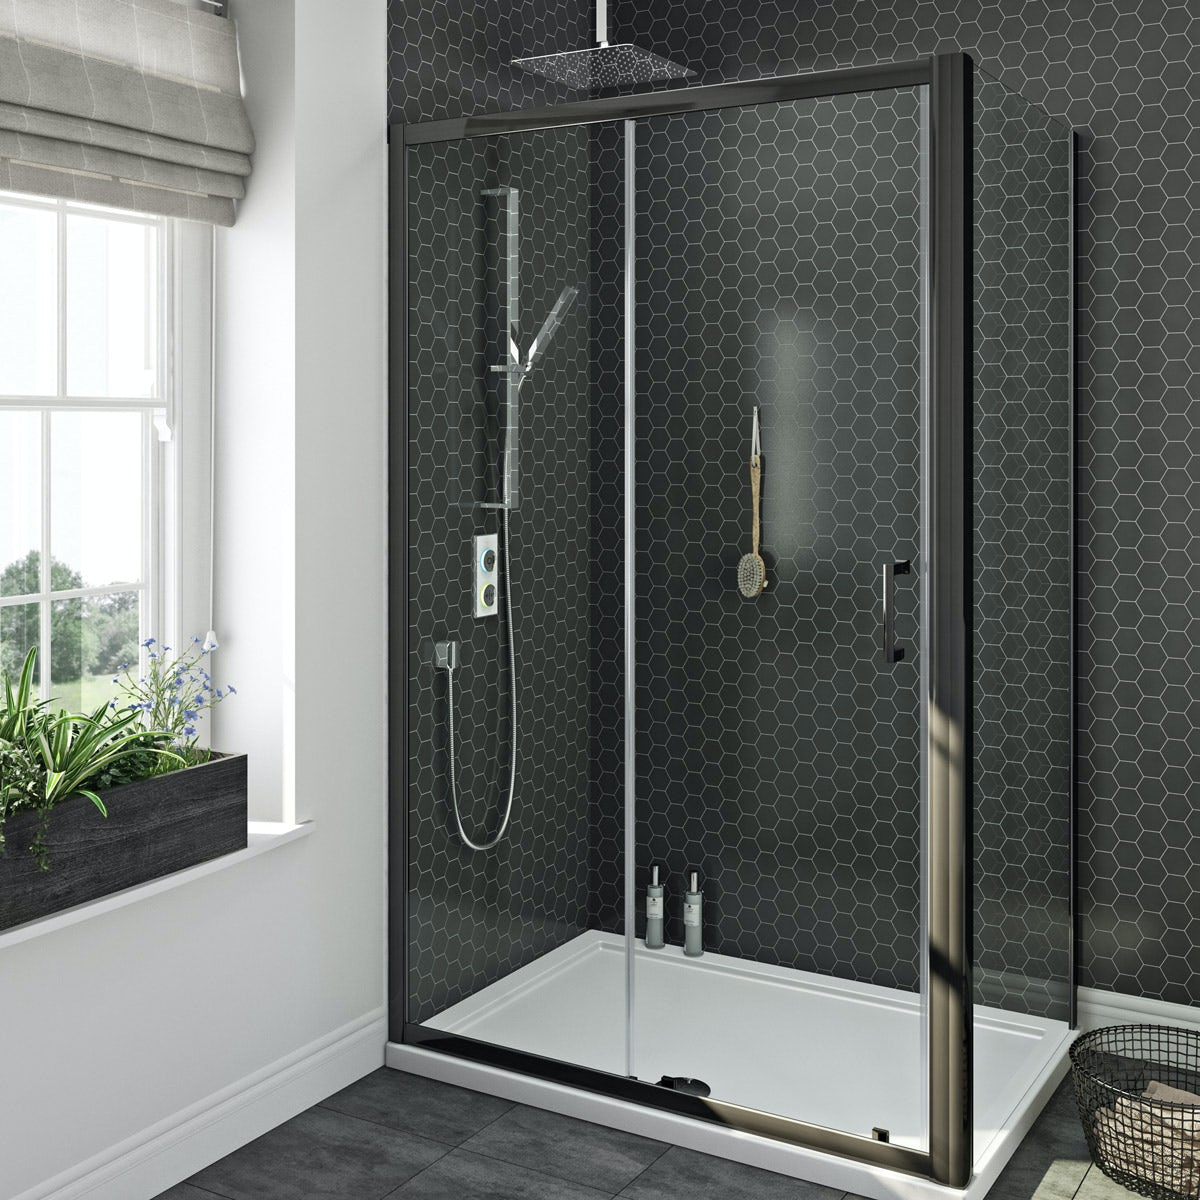 smartap white smart shower system with mode black shower